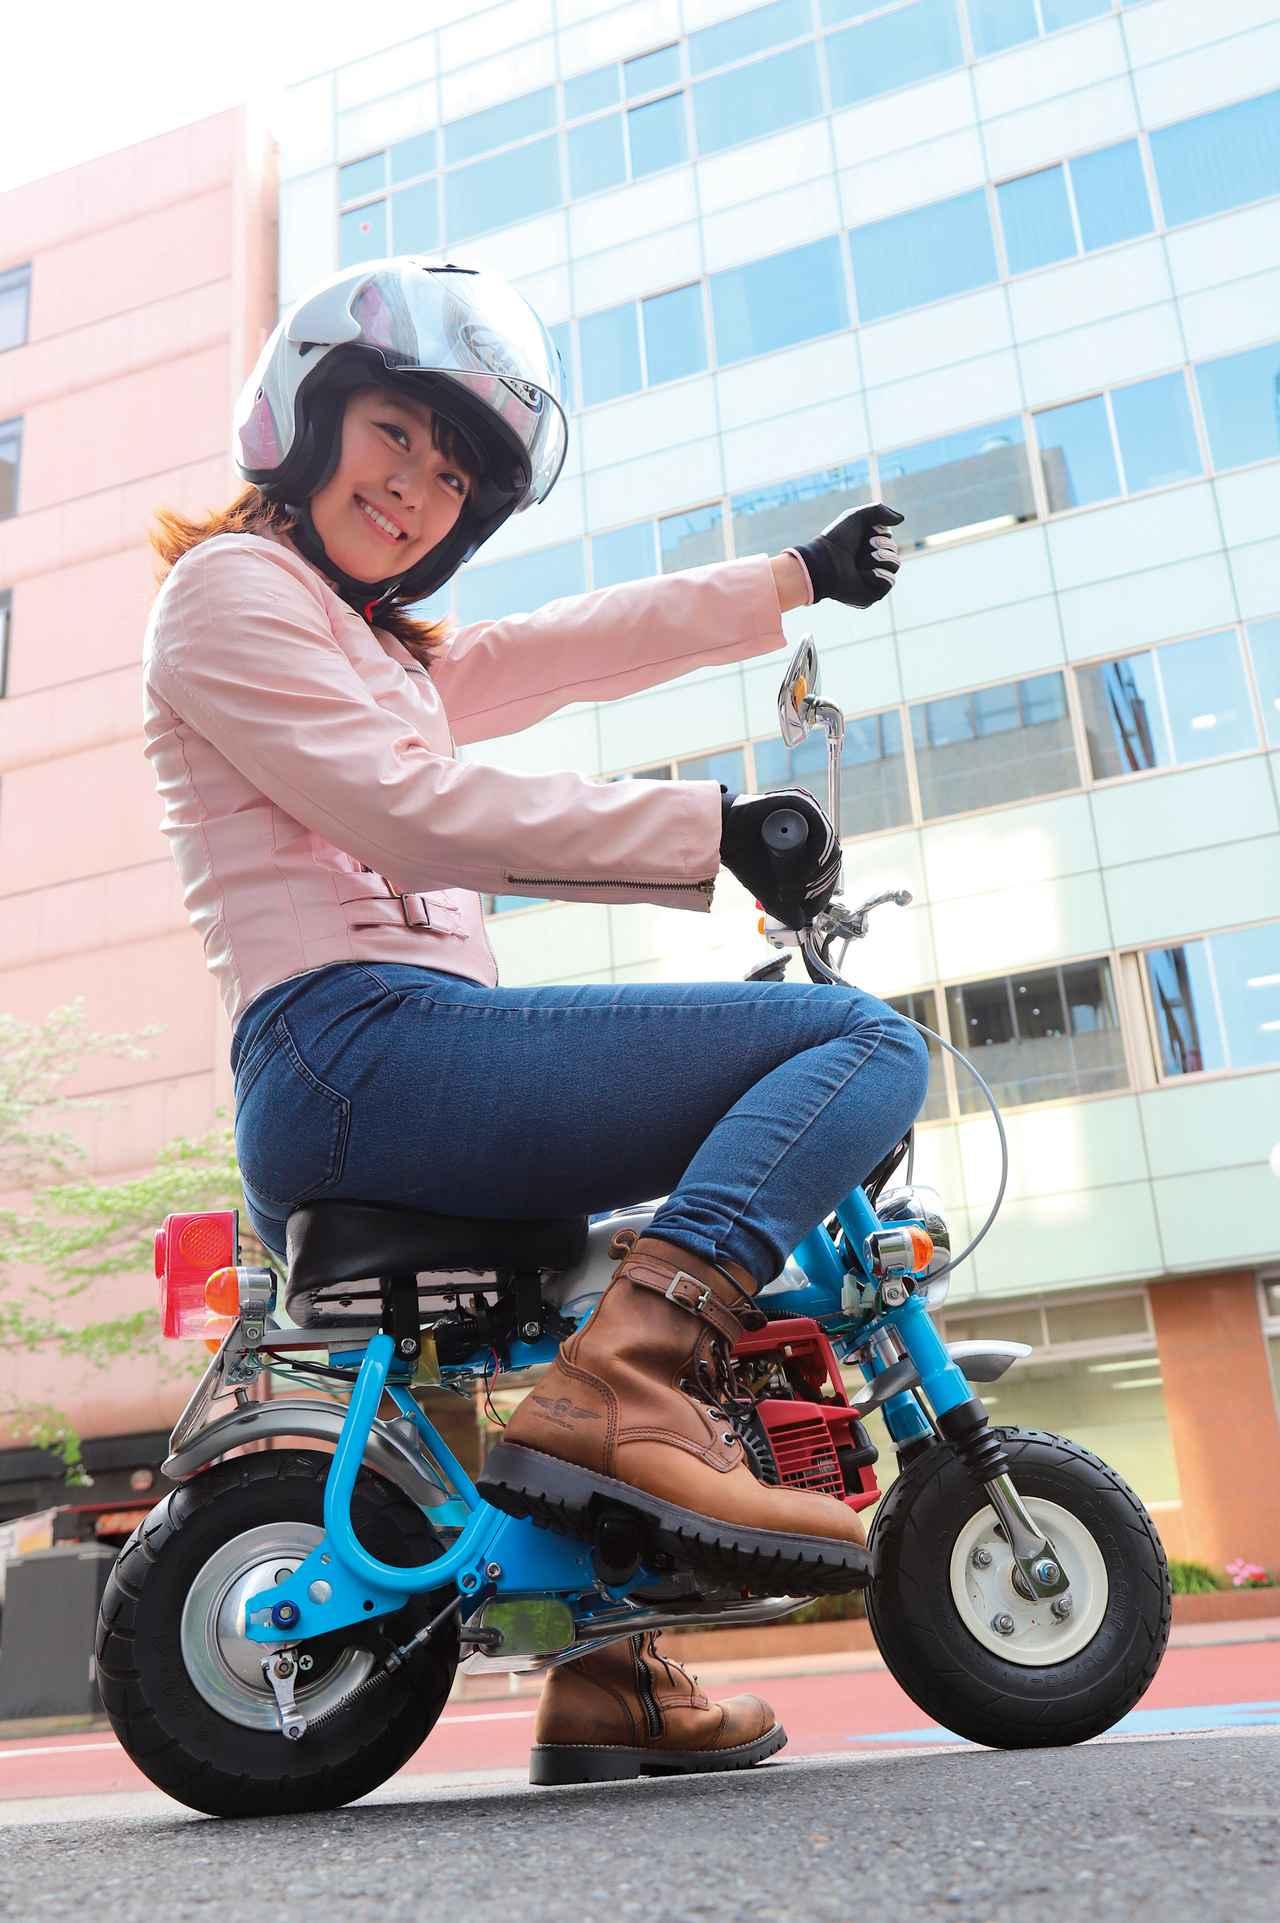 Images : 5番目の画像 - 「世界最小のキットバイク仔猿で走ろう‼ 試乗編「仔猿遊び・その3(全3回)」」のアルバム - webオートバイ